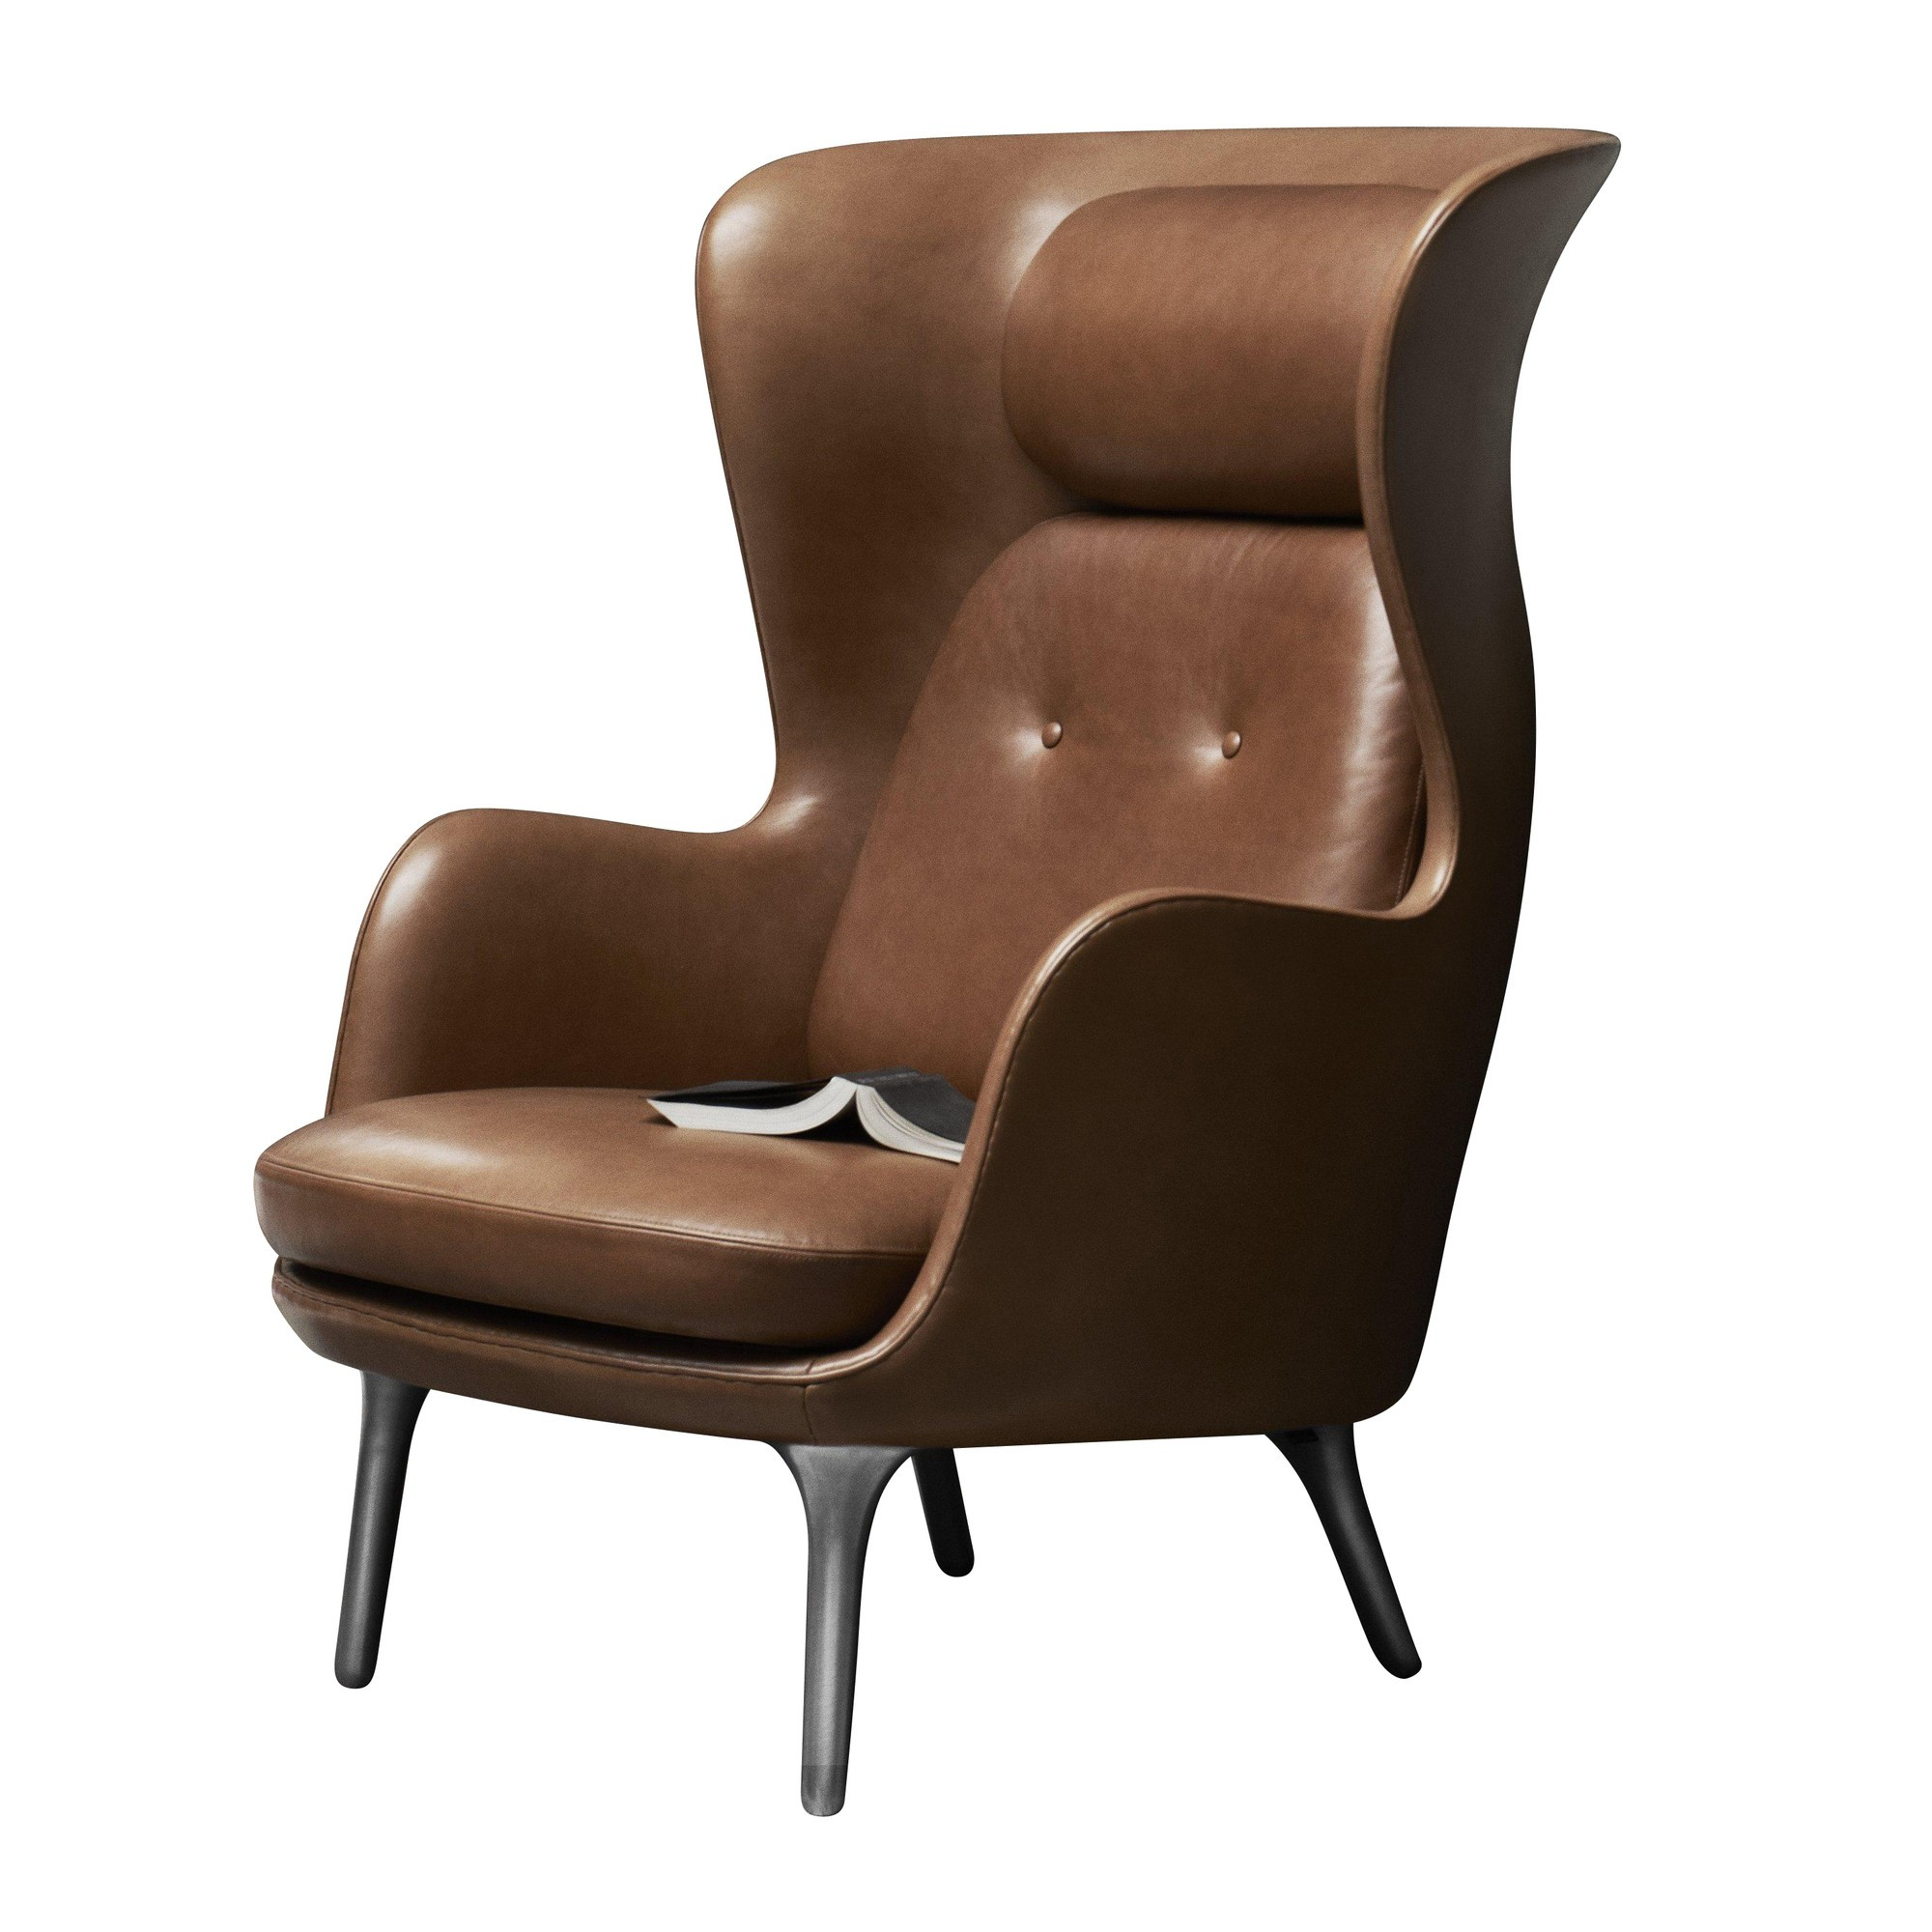 ... Wingback Chair Leather · Fritz Hansen - Ro™ Ohrensessel Leder - walnussbraun/Gestell ...  sc 1 st  AmbienteDirect & Fritz Hansen Ro™ Wingback Chair Leather   AmbienteDirect